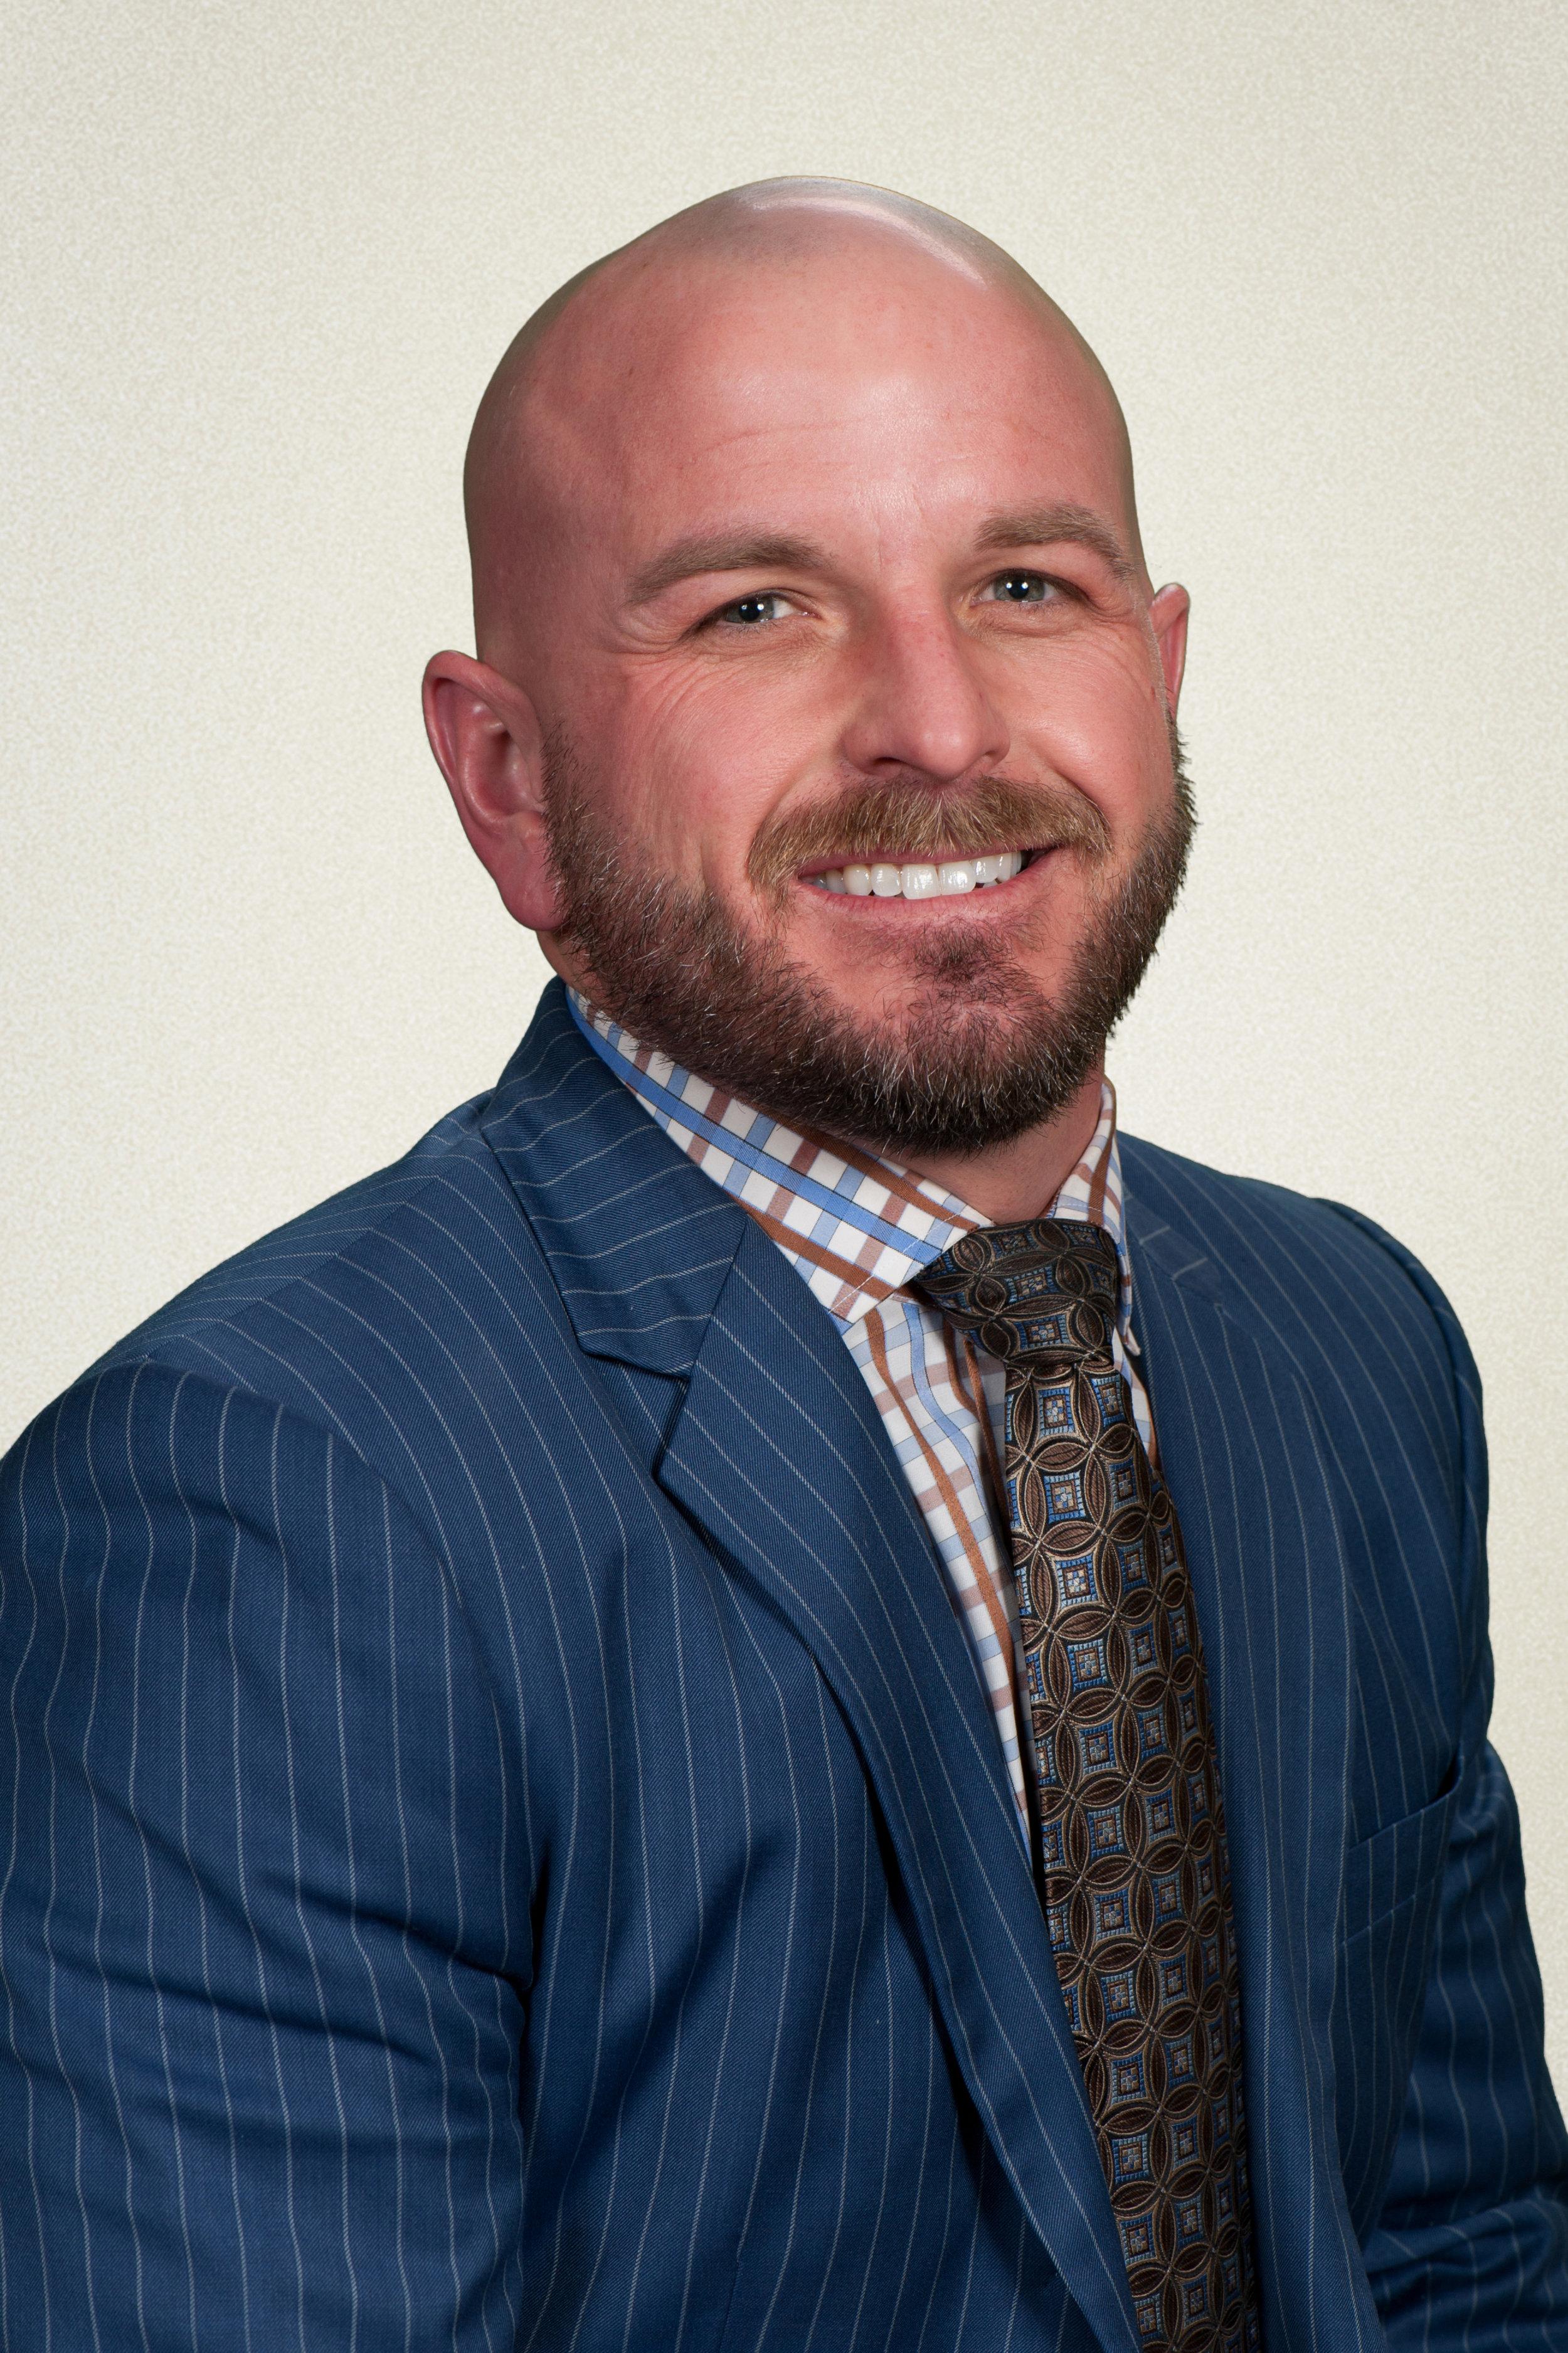 John C. Reimers - Board MemberVice President Operations,Towne Park